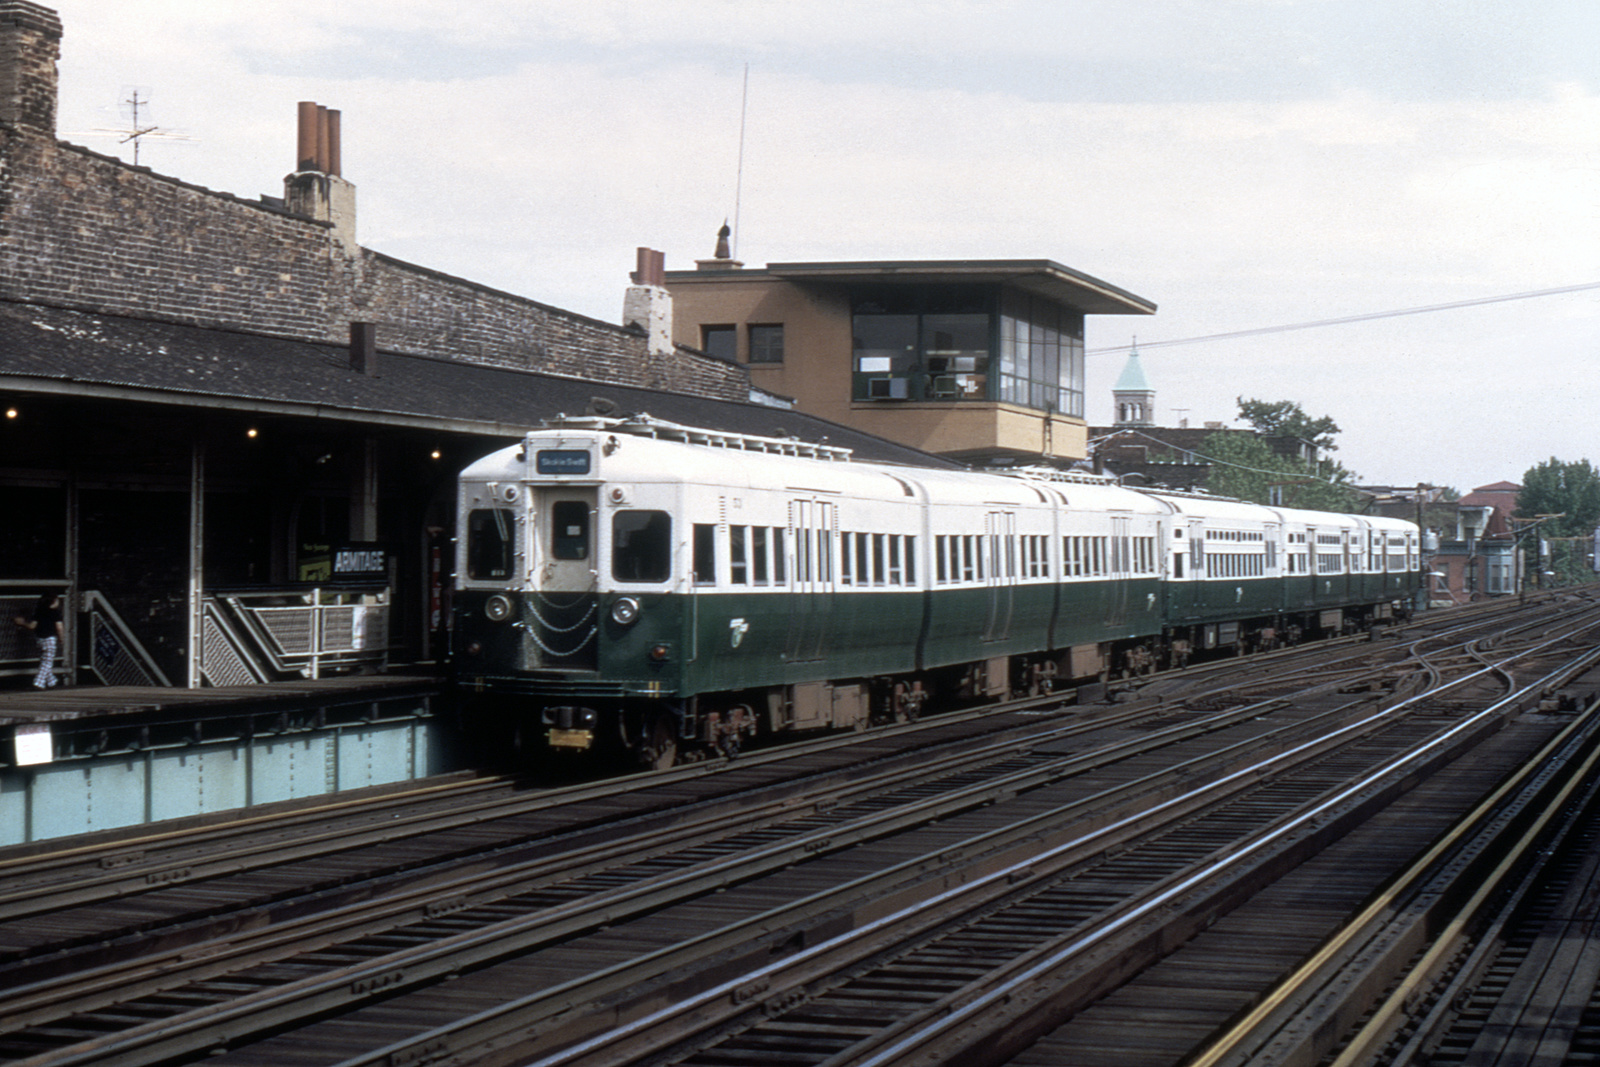 (717k, 1600x1067)<br><b>Country:</b> United States<br><b>City:</b> Chicago, IL<br><b>System:</b> Chicago Transit Authority<br><b>Line:</b> CTA Brown/Purple<br><b>Location:</b> Armitage<br><b>Route:</b> Fan Trip<br><b>Car:</b> CTA 51-54 Series 53 <br><b>Collection of:</b> David Pirmann<br><b>Date:</b> 5/28/1973<br><b>Viewed (this week/total):</b> 0 / 782